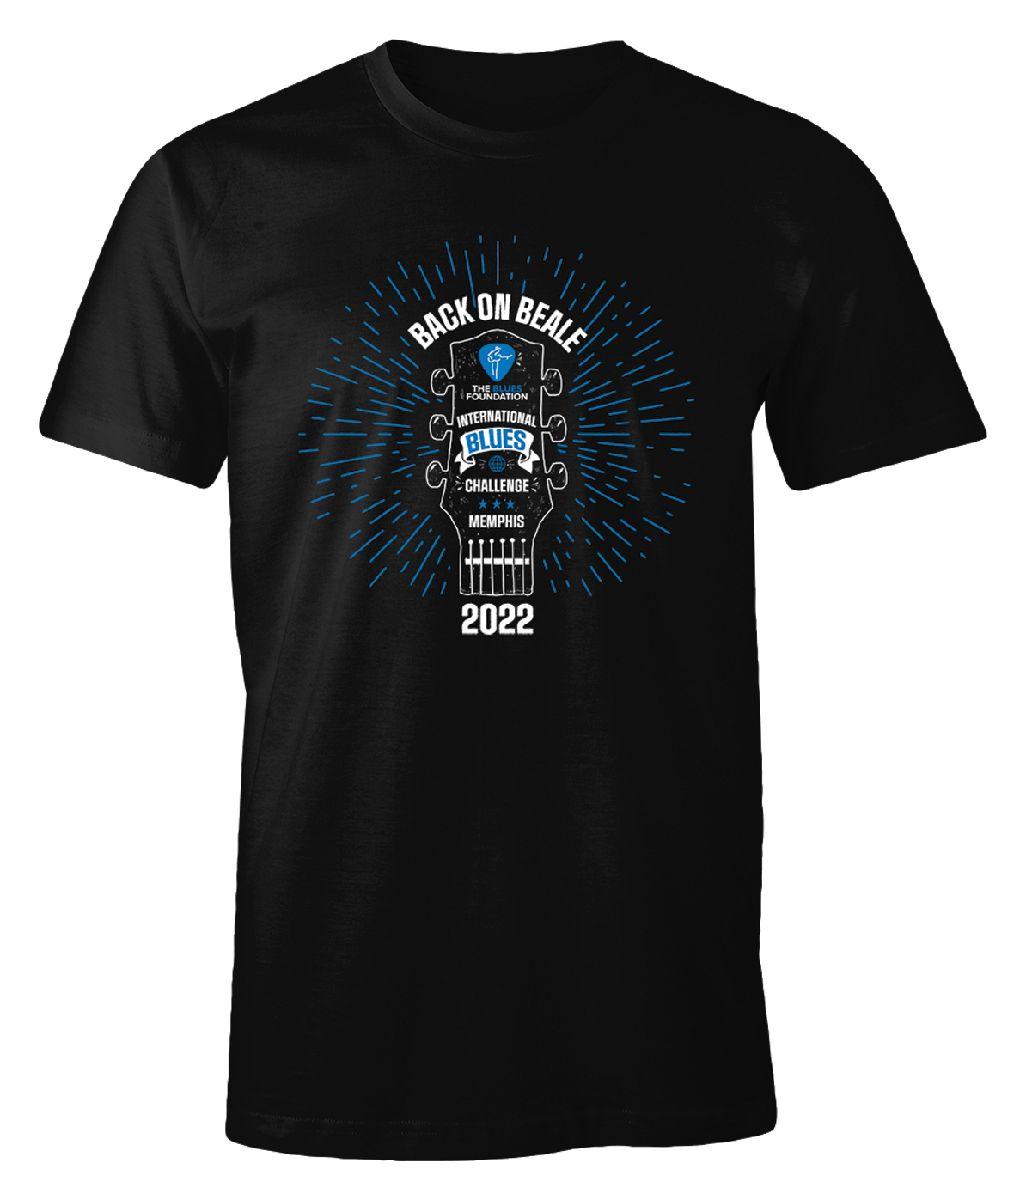 ibc 2022 black t-shirt